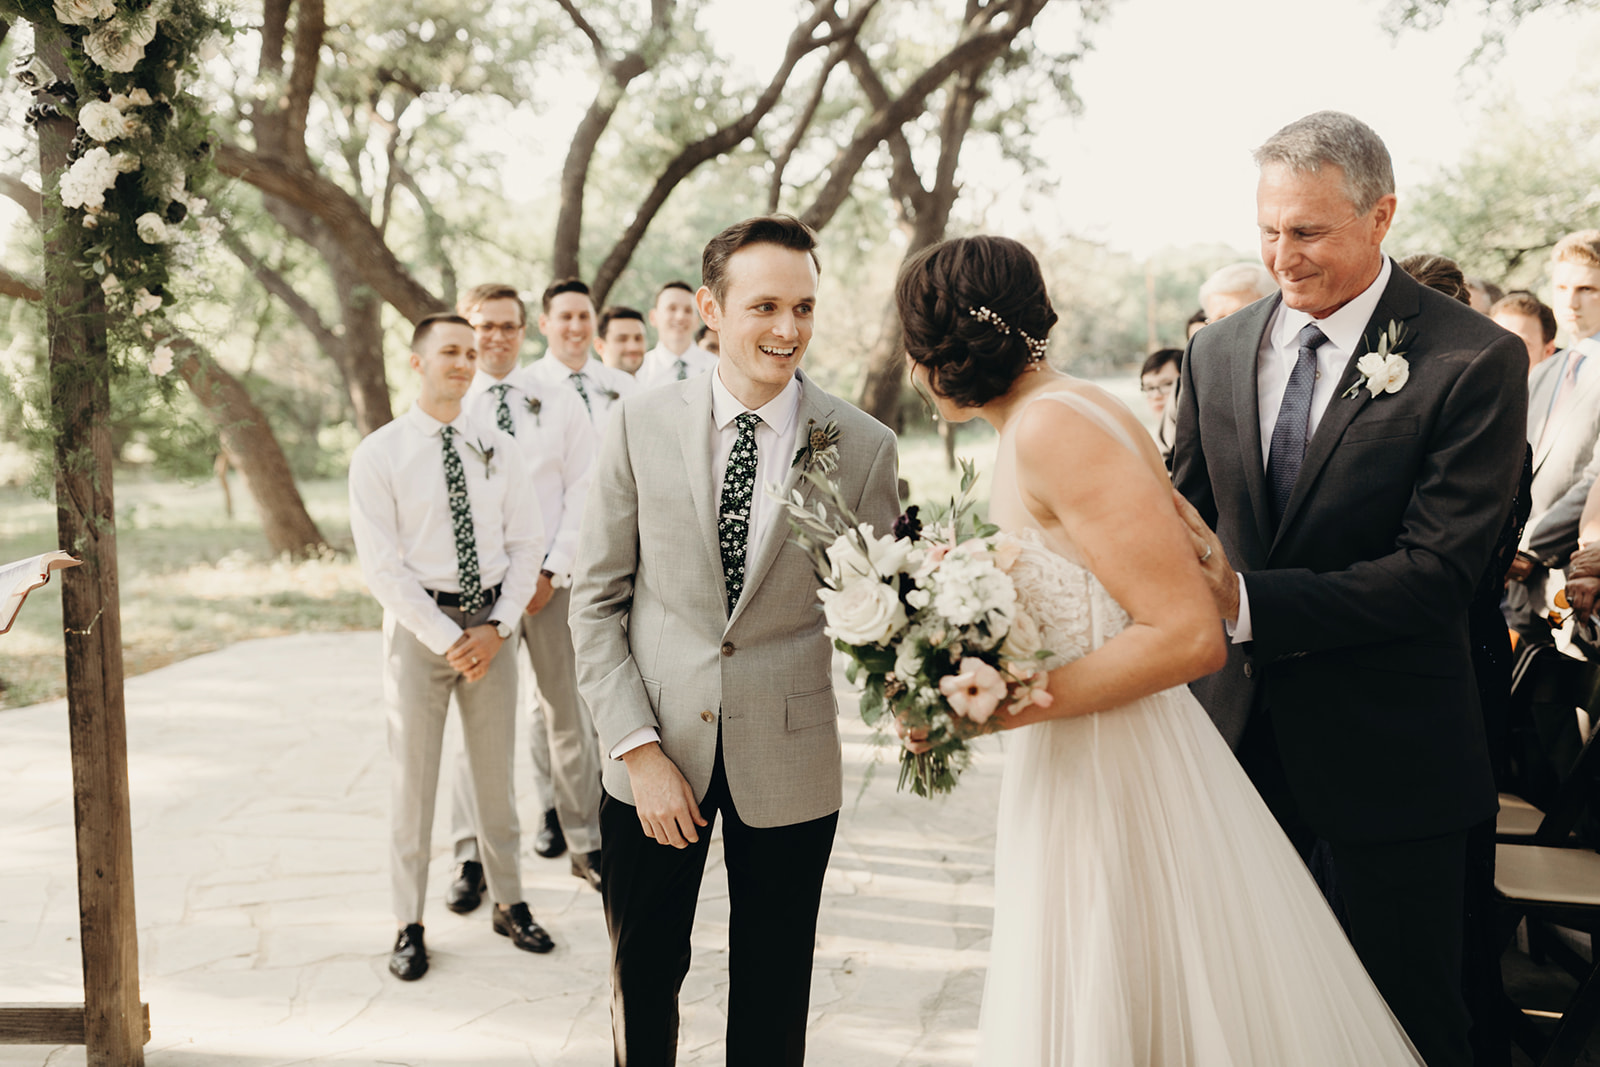 austin-wedding-lindsey-bryce-340.jpg